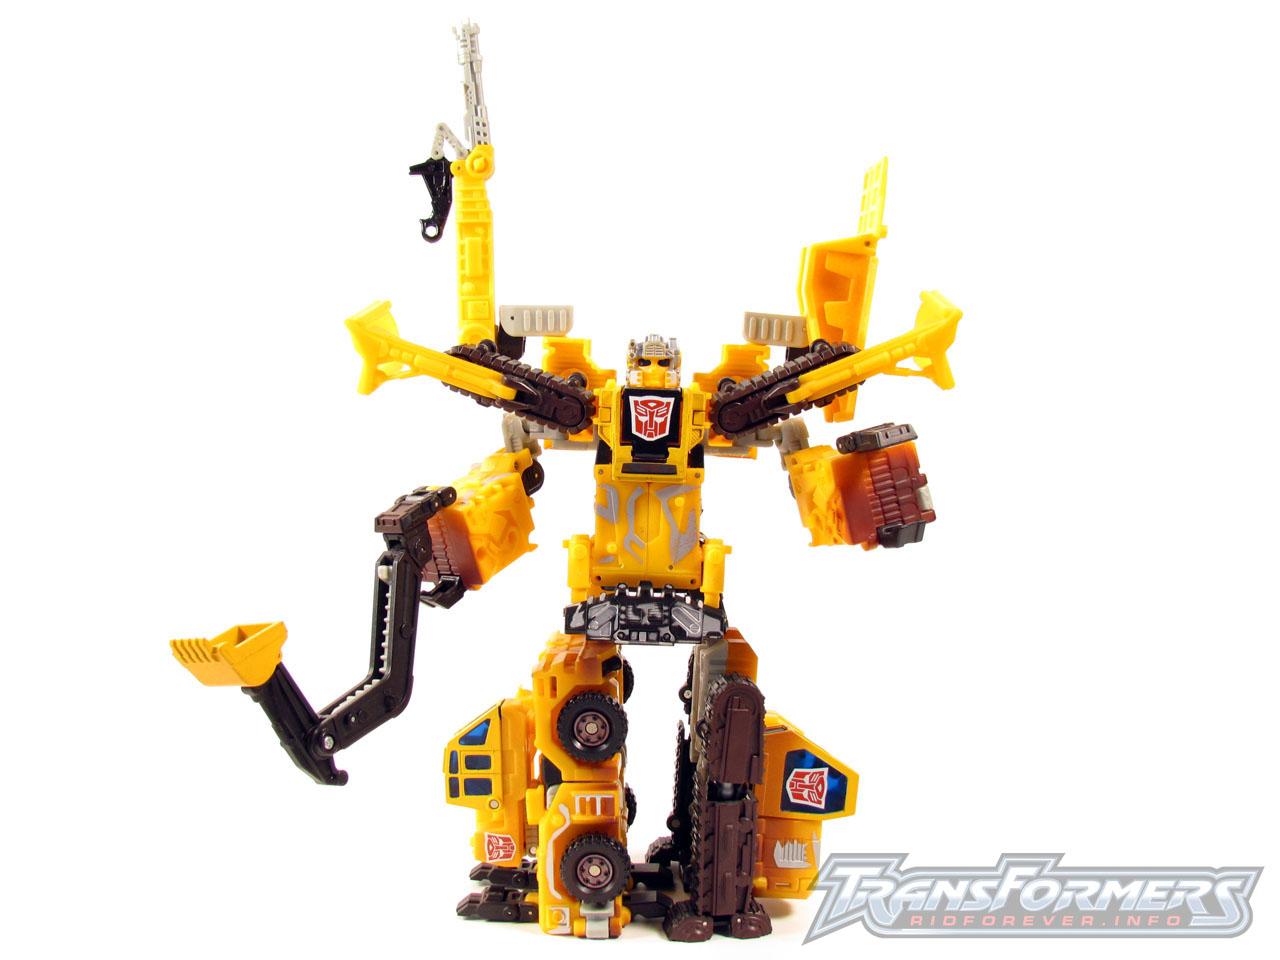 RID Landfill Yellow 007